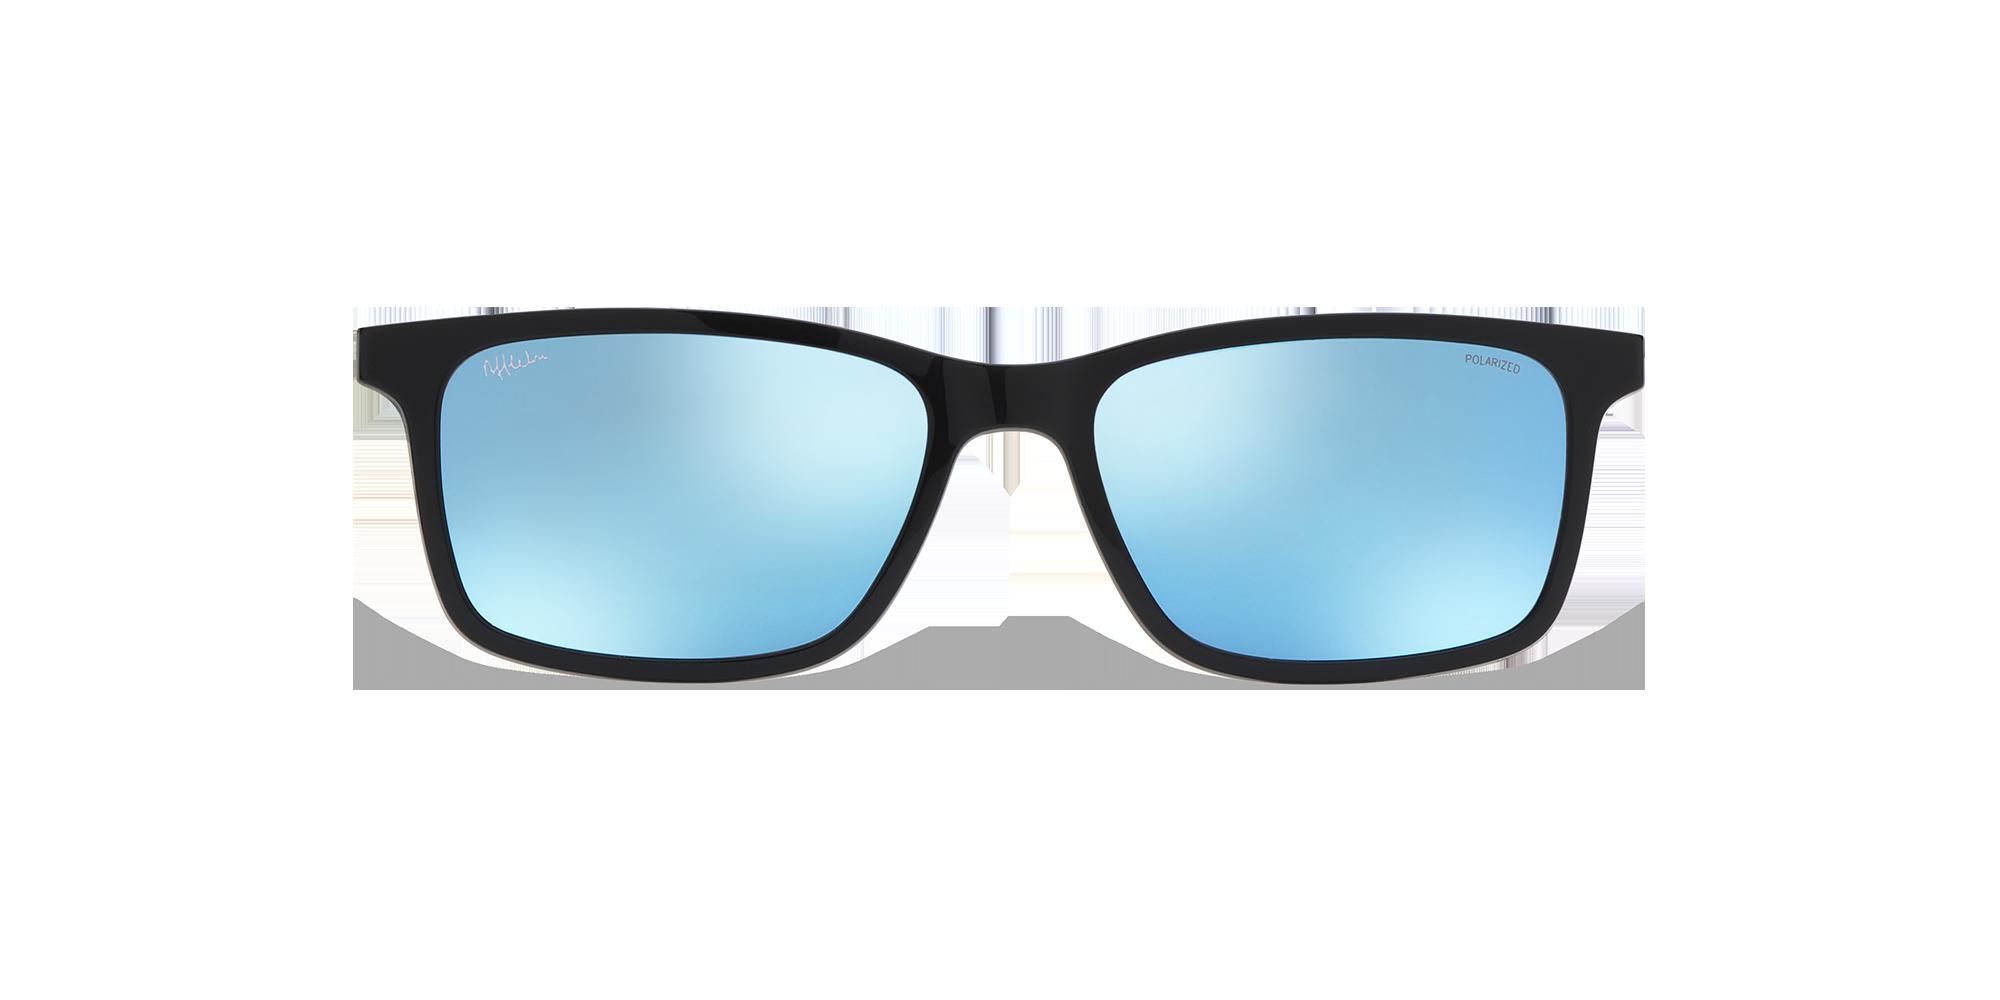 afflelou/france/products/smart_clip/clips_glasses/TMK32PRBK015316.png